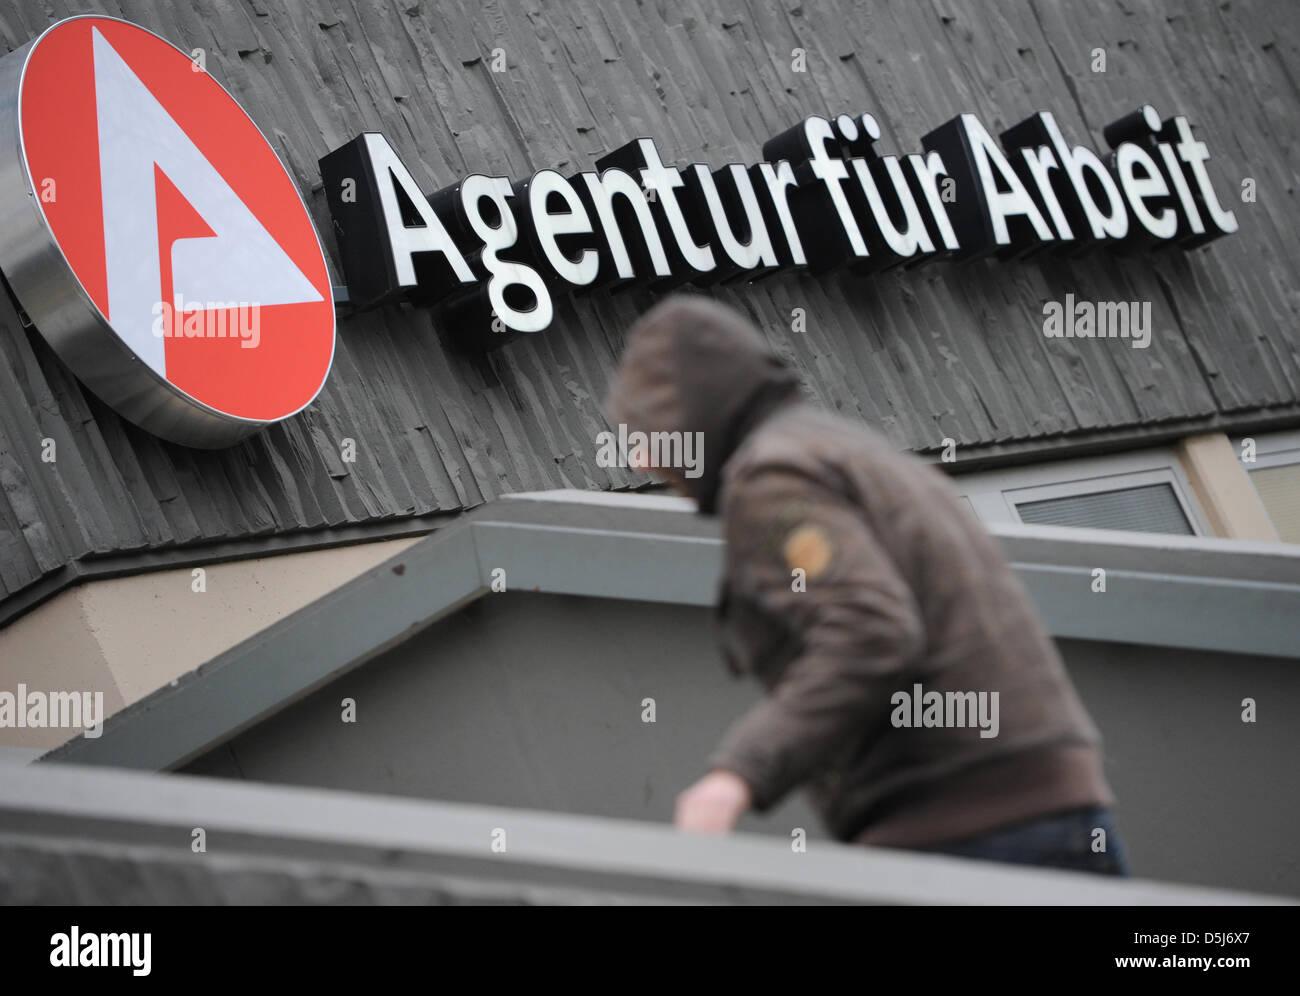 A man walks towards the Agentur fuer Arbeit (German employment agency) in Wiesbaden,Germany, 15 November 2012. Stock Photo